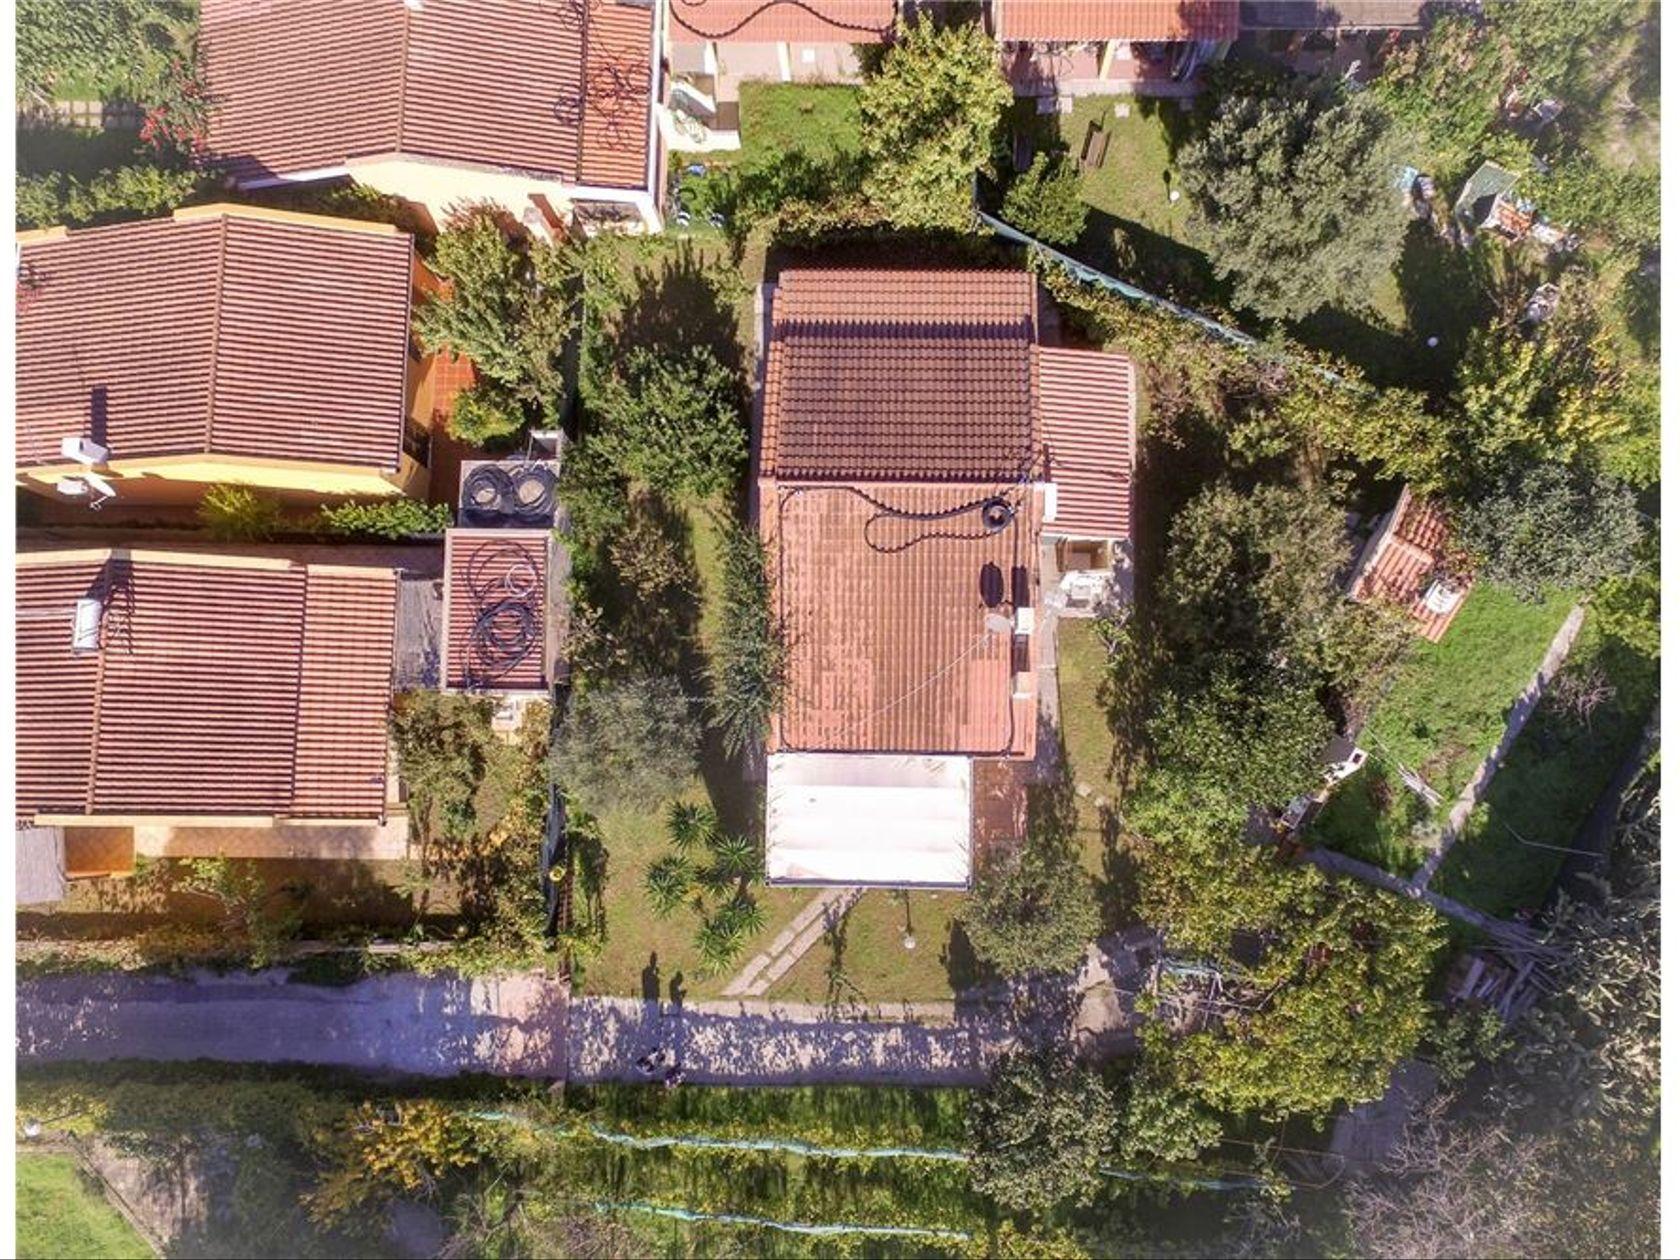 Villa singola Geremeas, Maracalagonis, CA Vendita - Foto 2